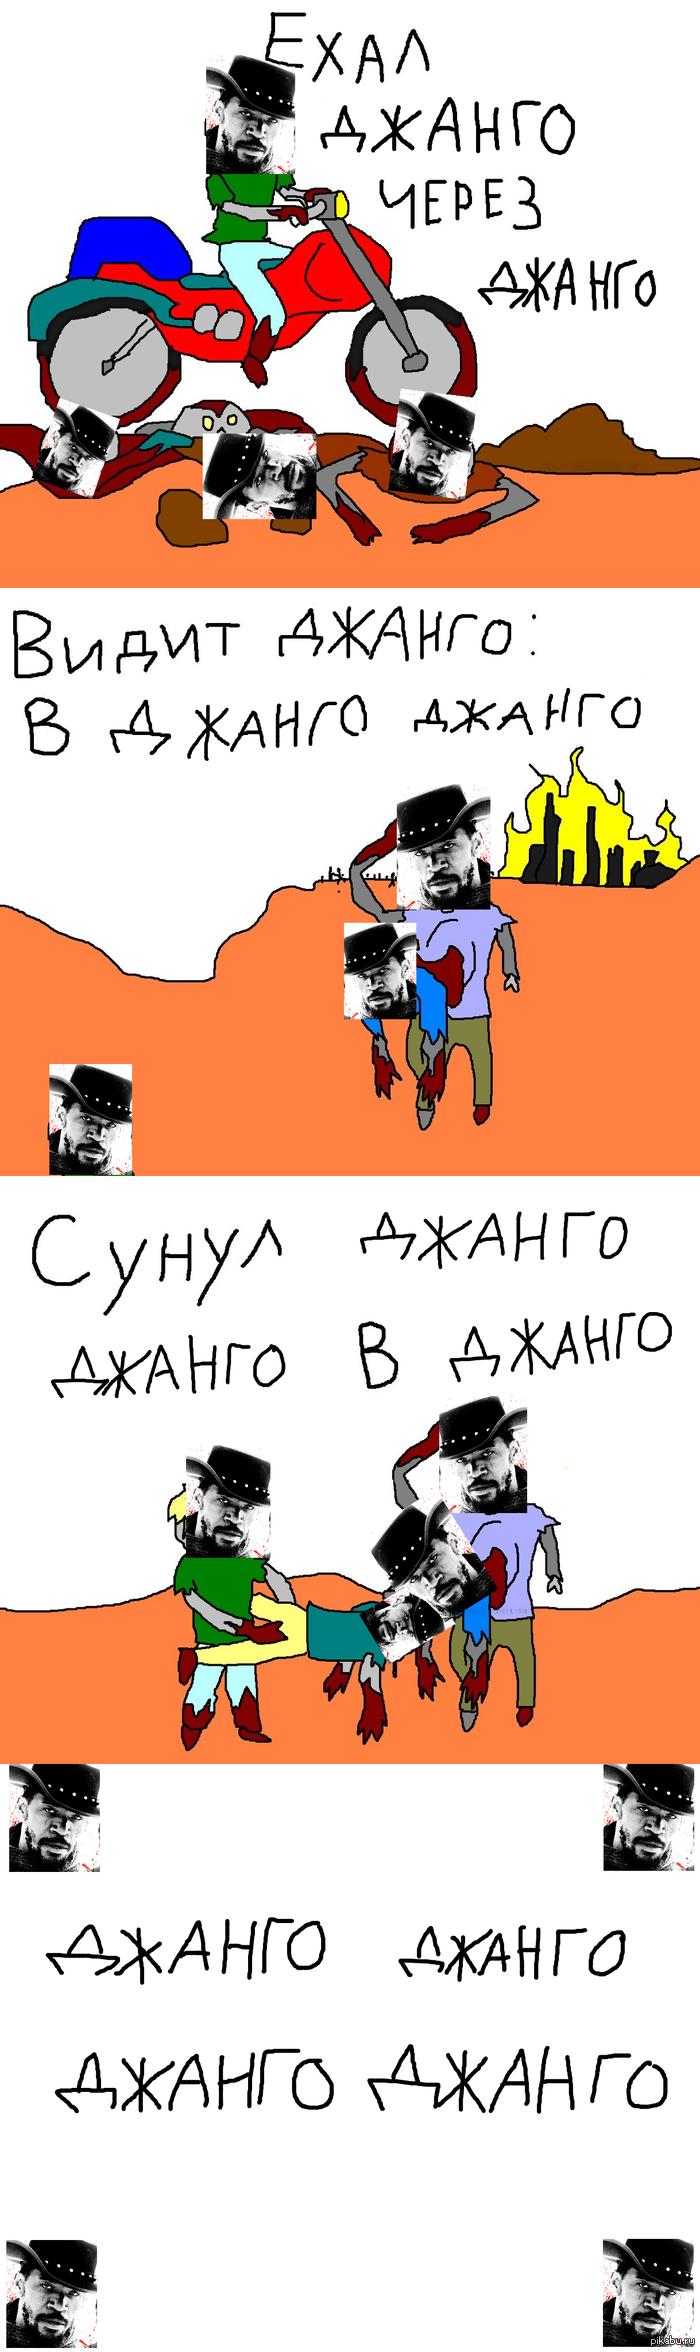 Упрлс? Навеяно пикчей: http://pikabu.ru/story/_1228208